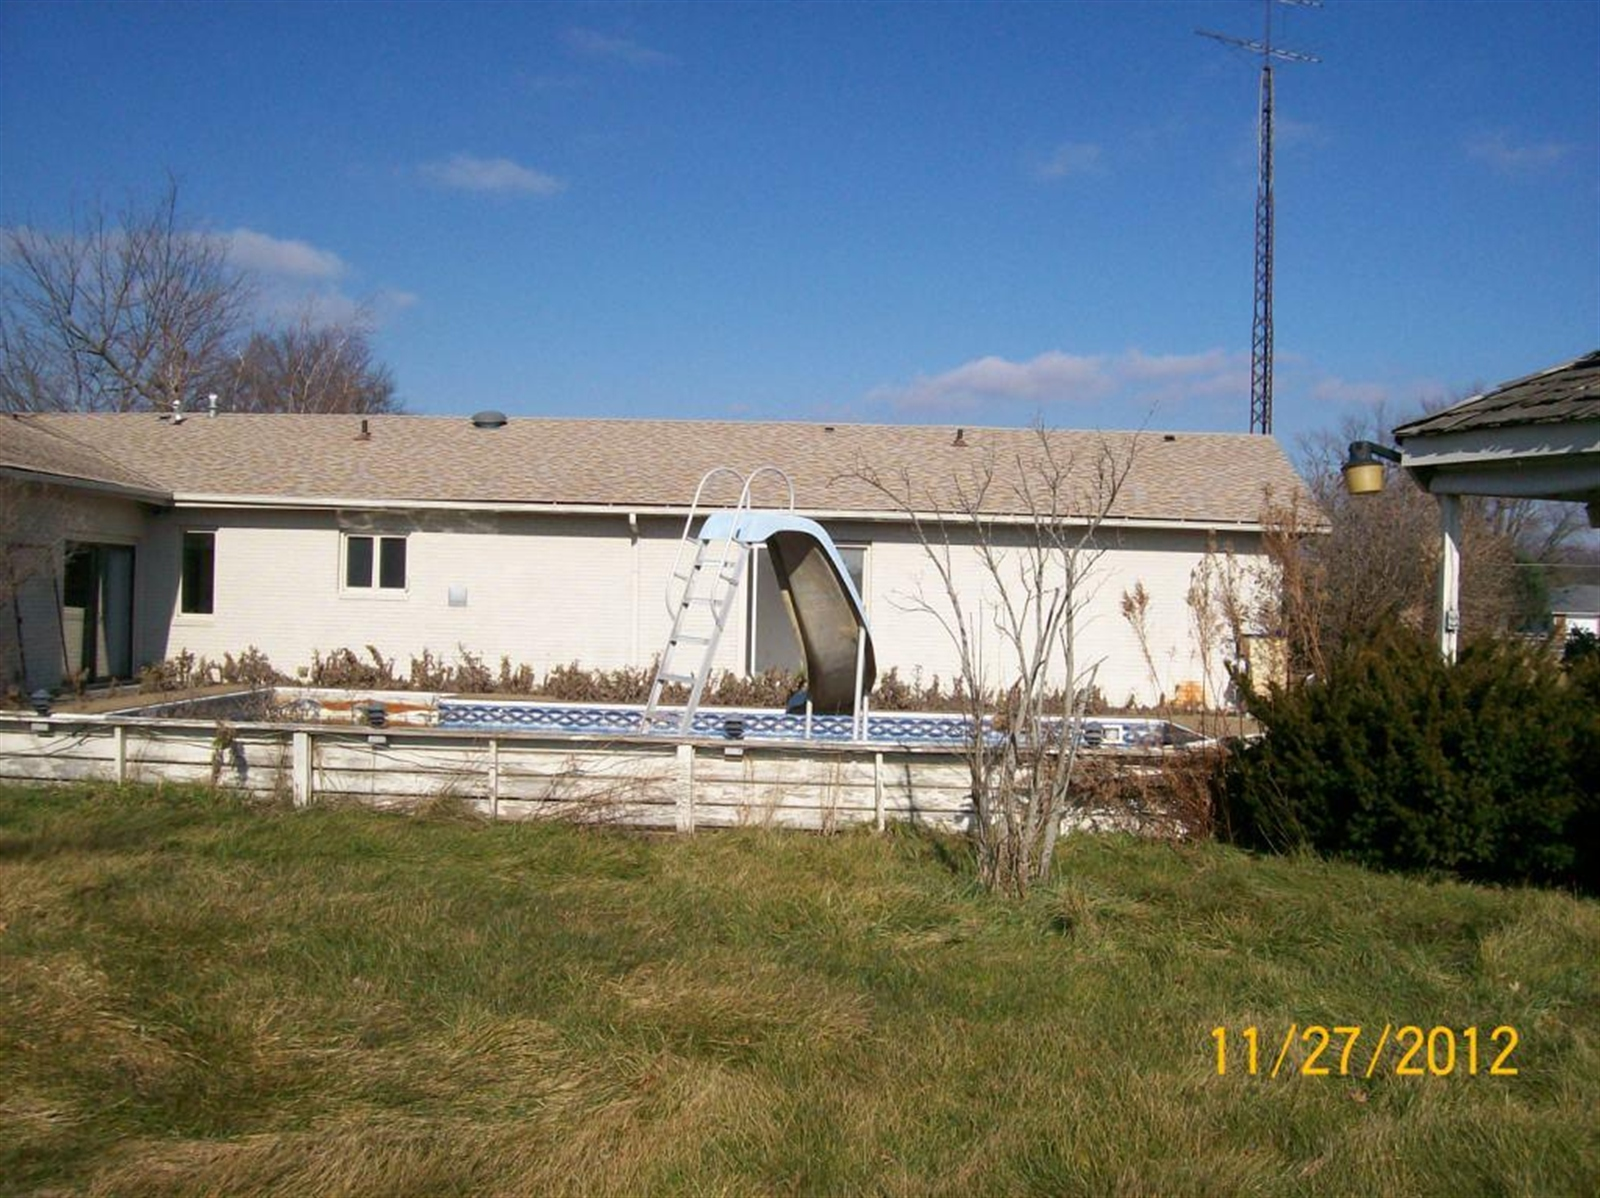 Real Estate Photography - 3077 E SR 236, ANDERSON, IN, 46011 - Location 4